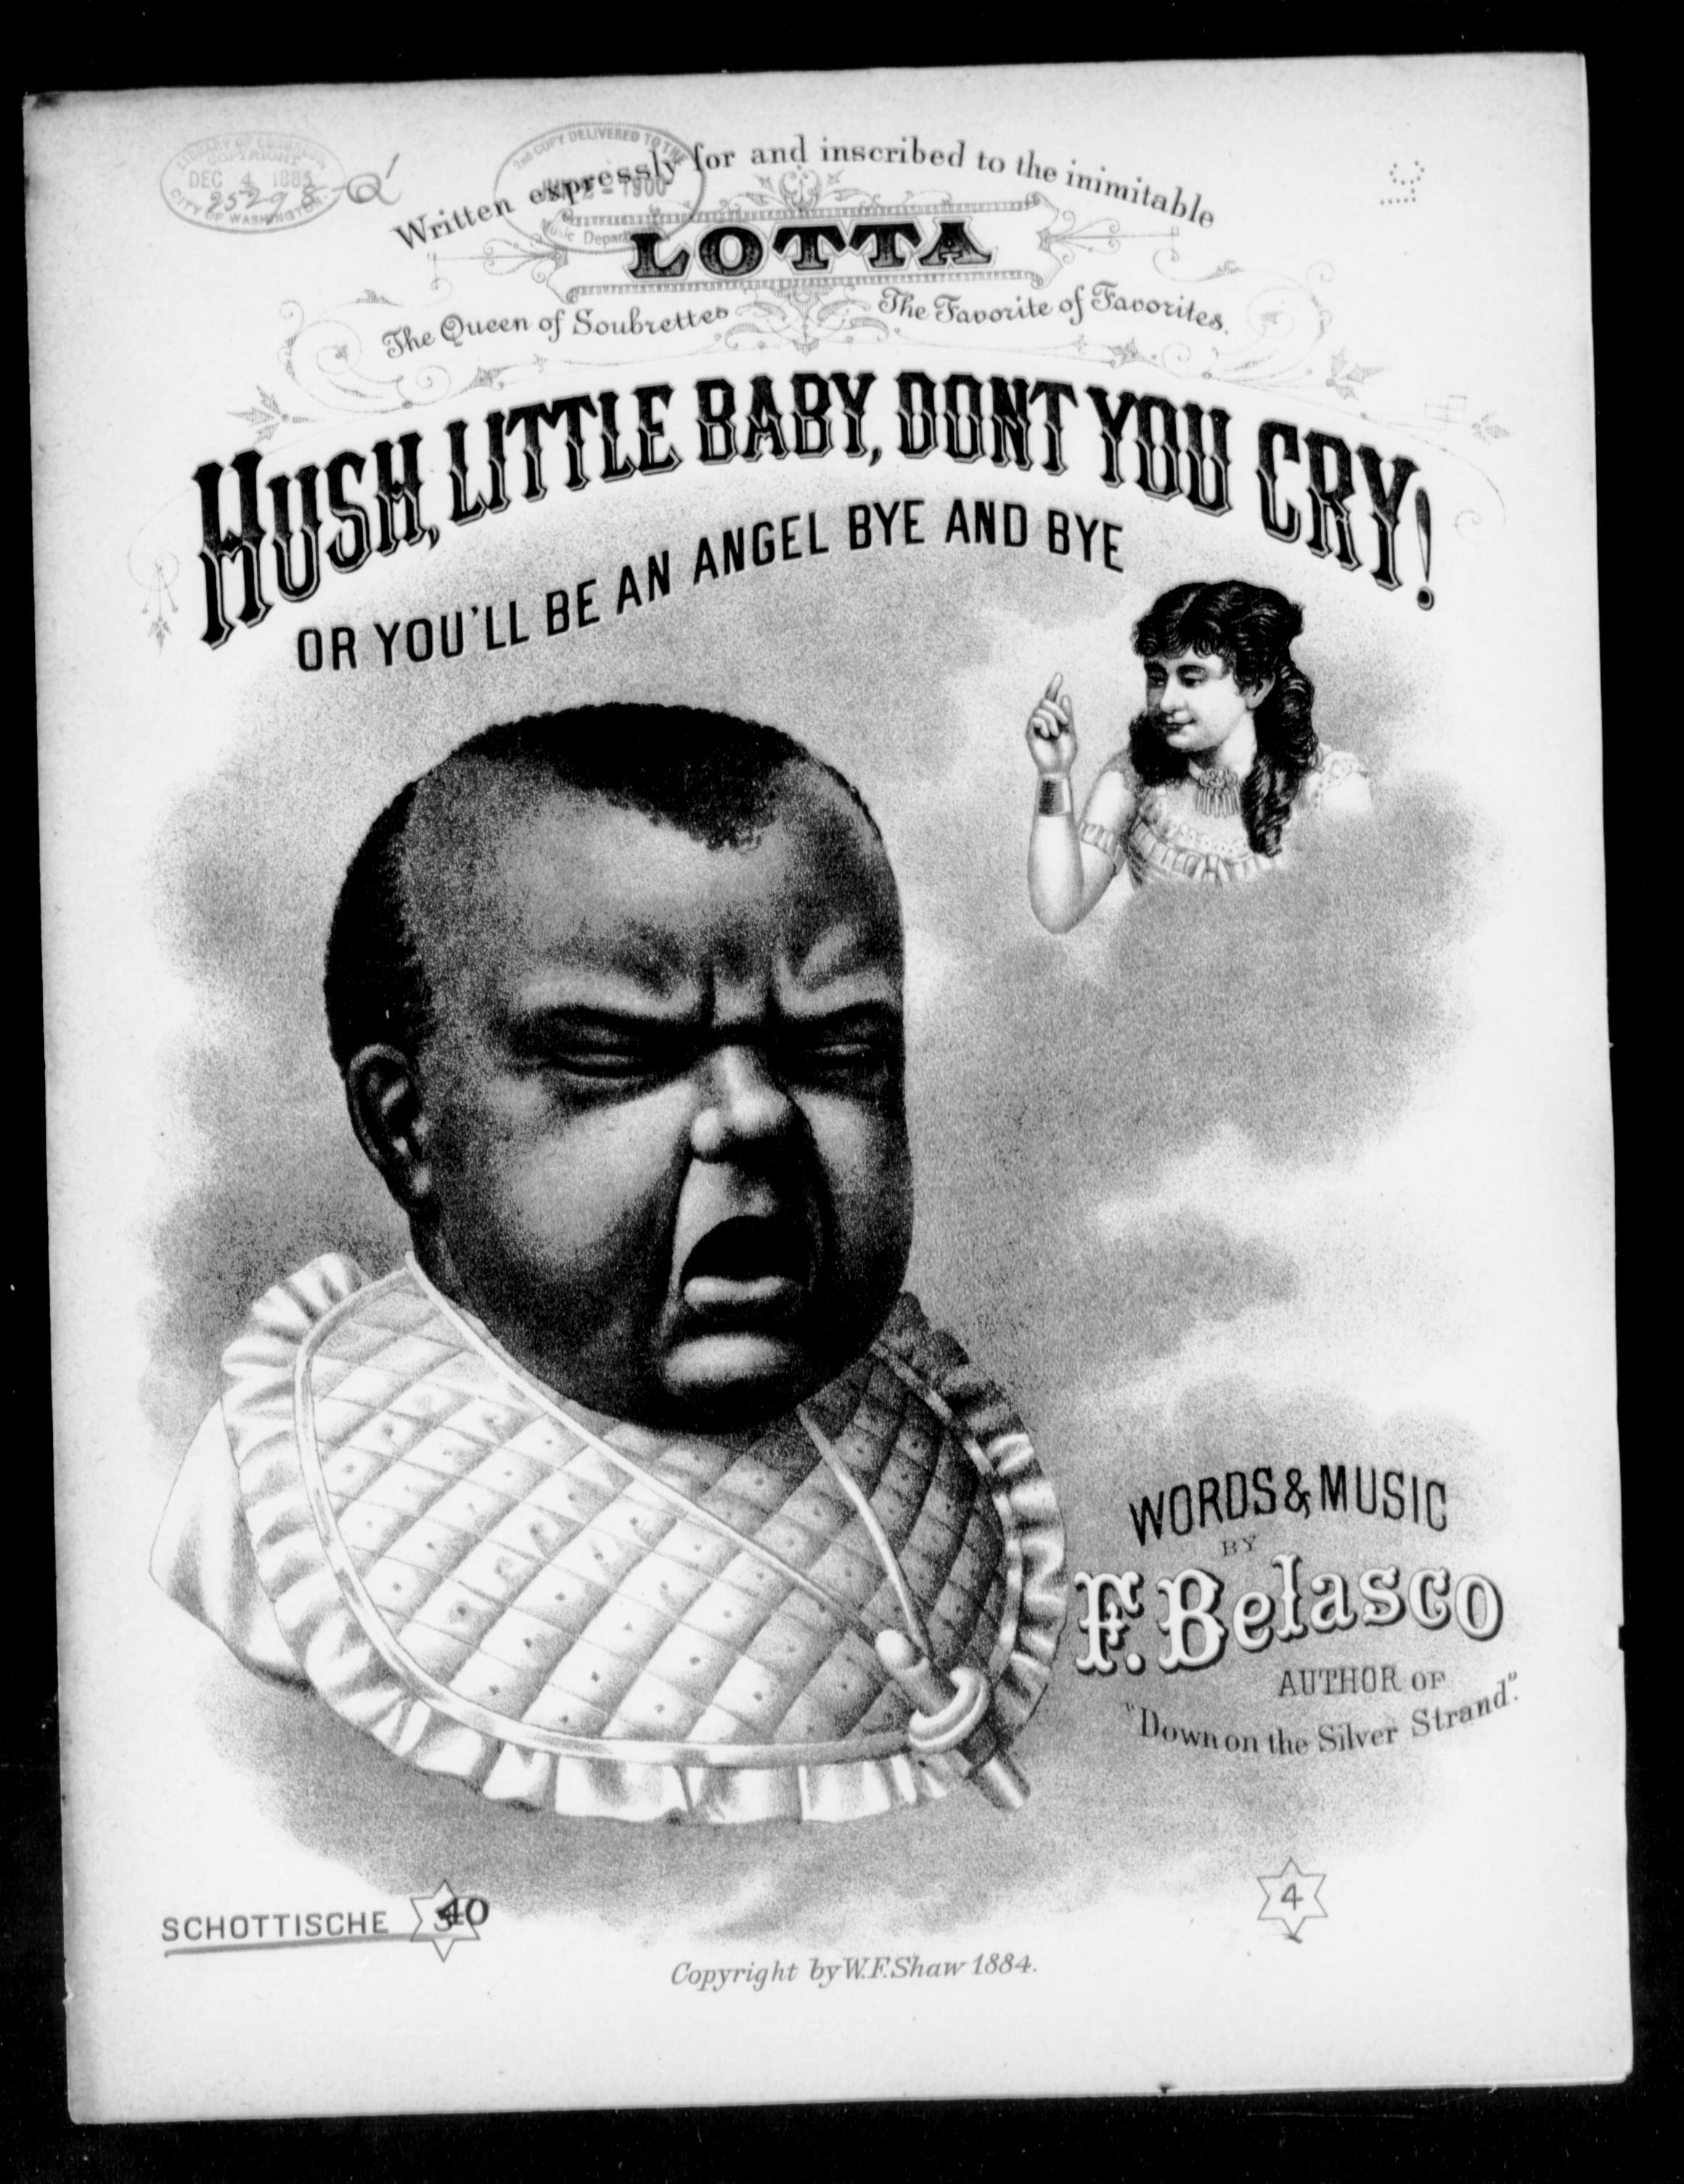 Hush Little Baby Don T You Cry Schottische Sheet Music Print Material Description